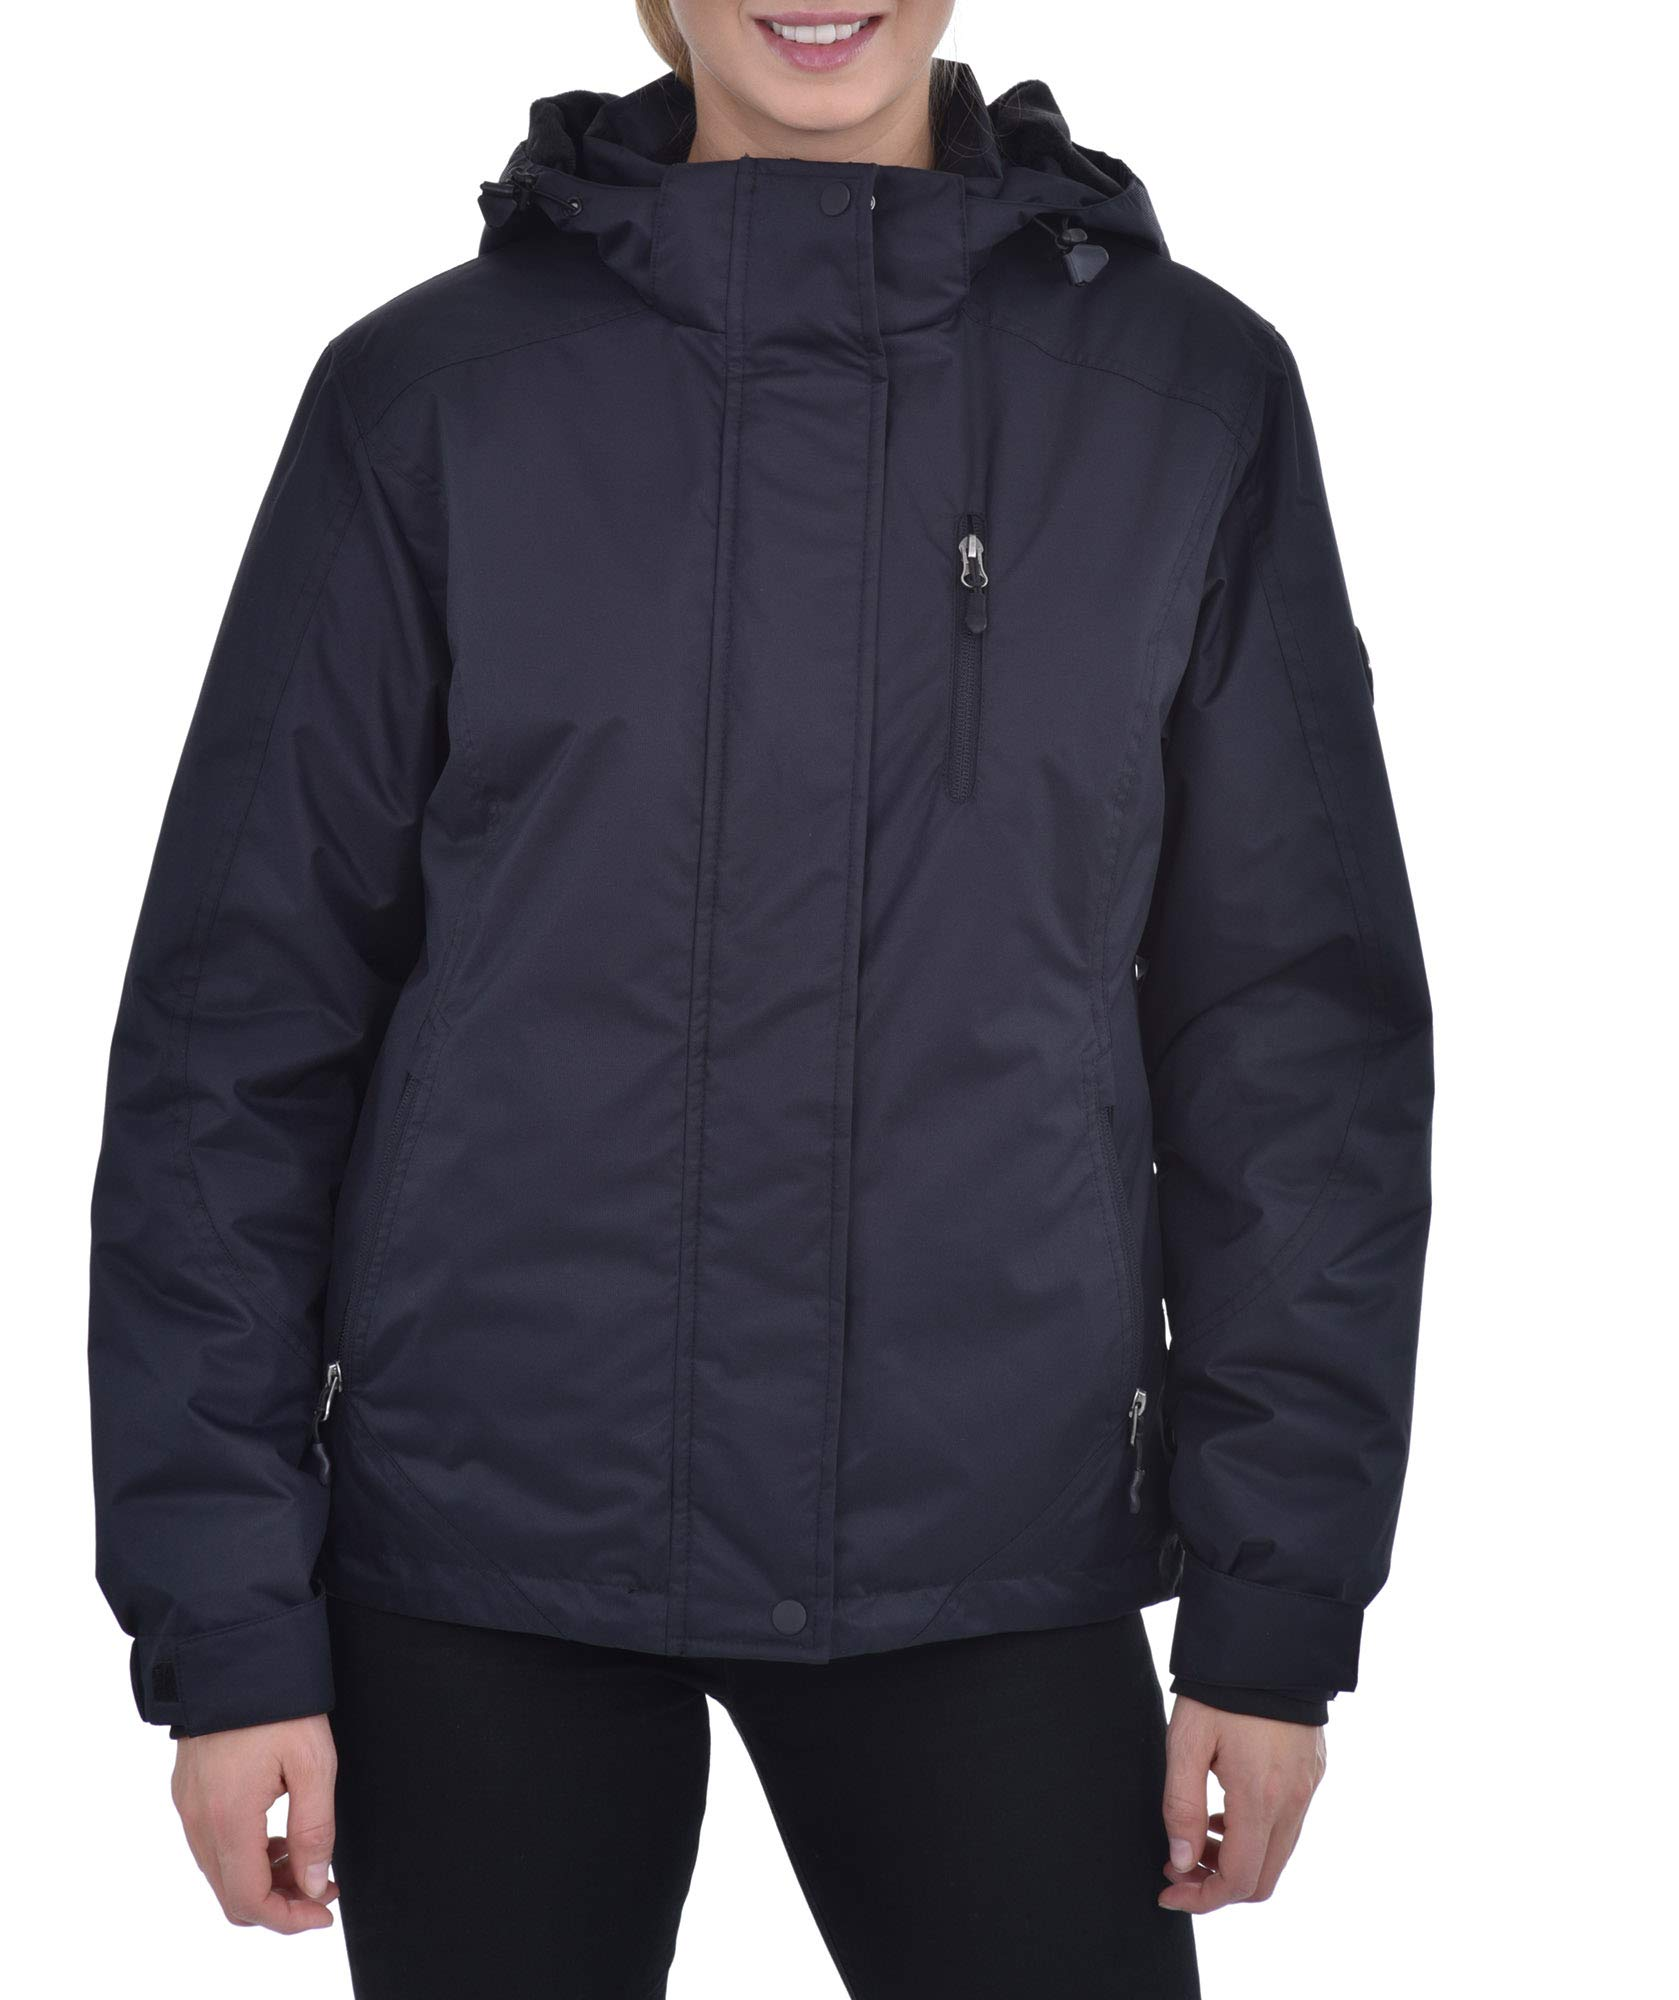 Swiss Alps Womens Insulated Waterproof Performance Winter Ski Jacket Coat